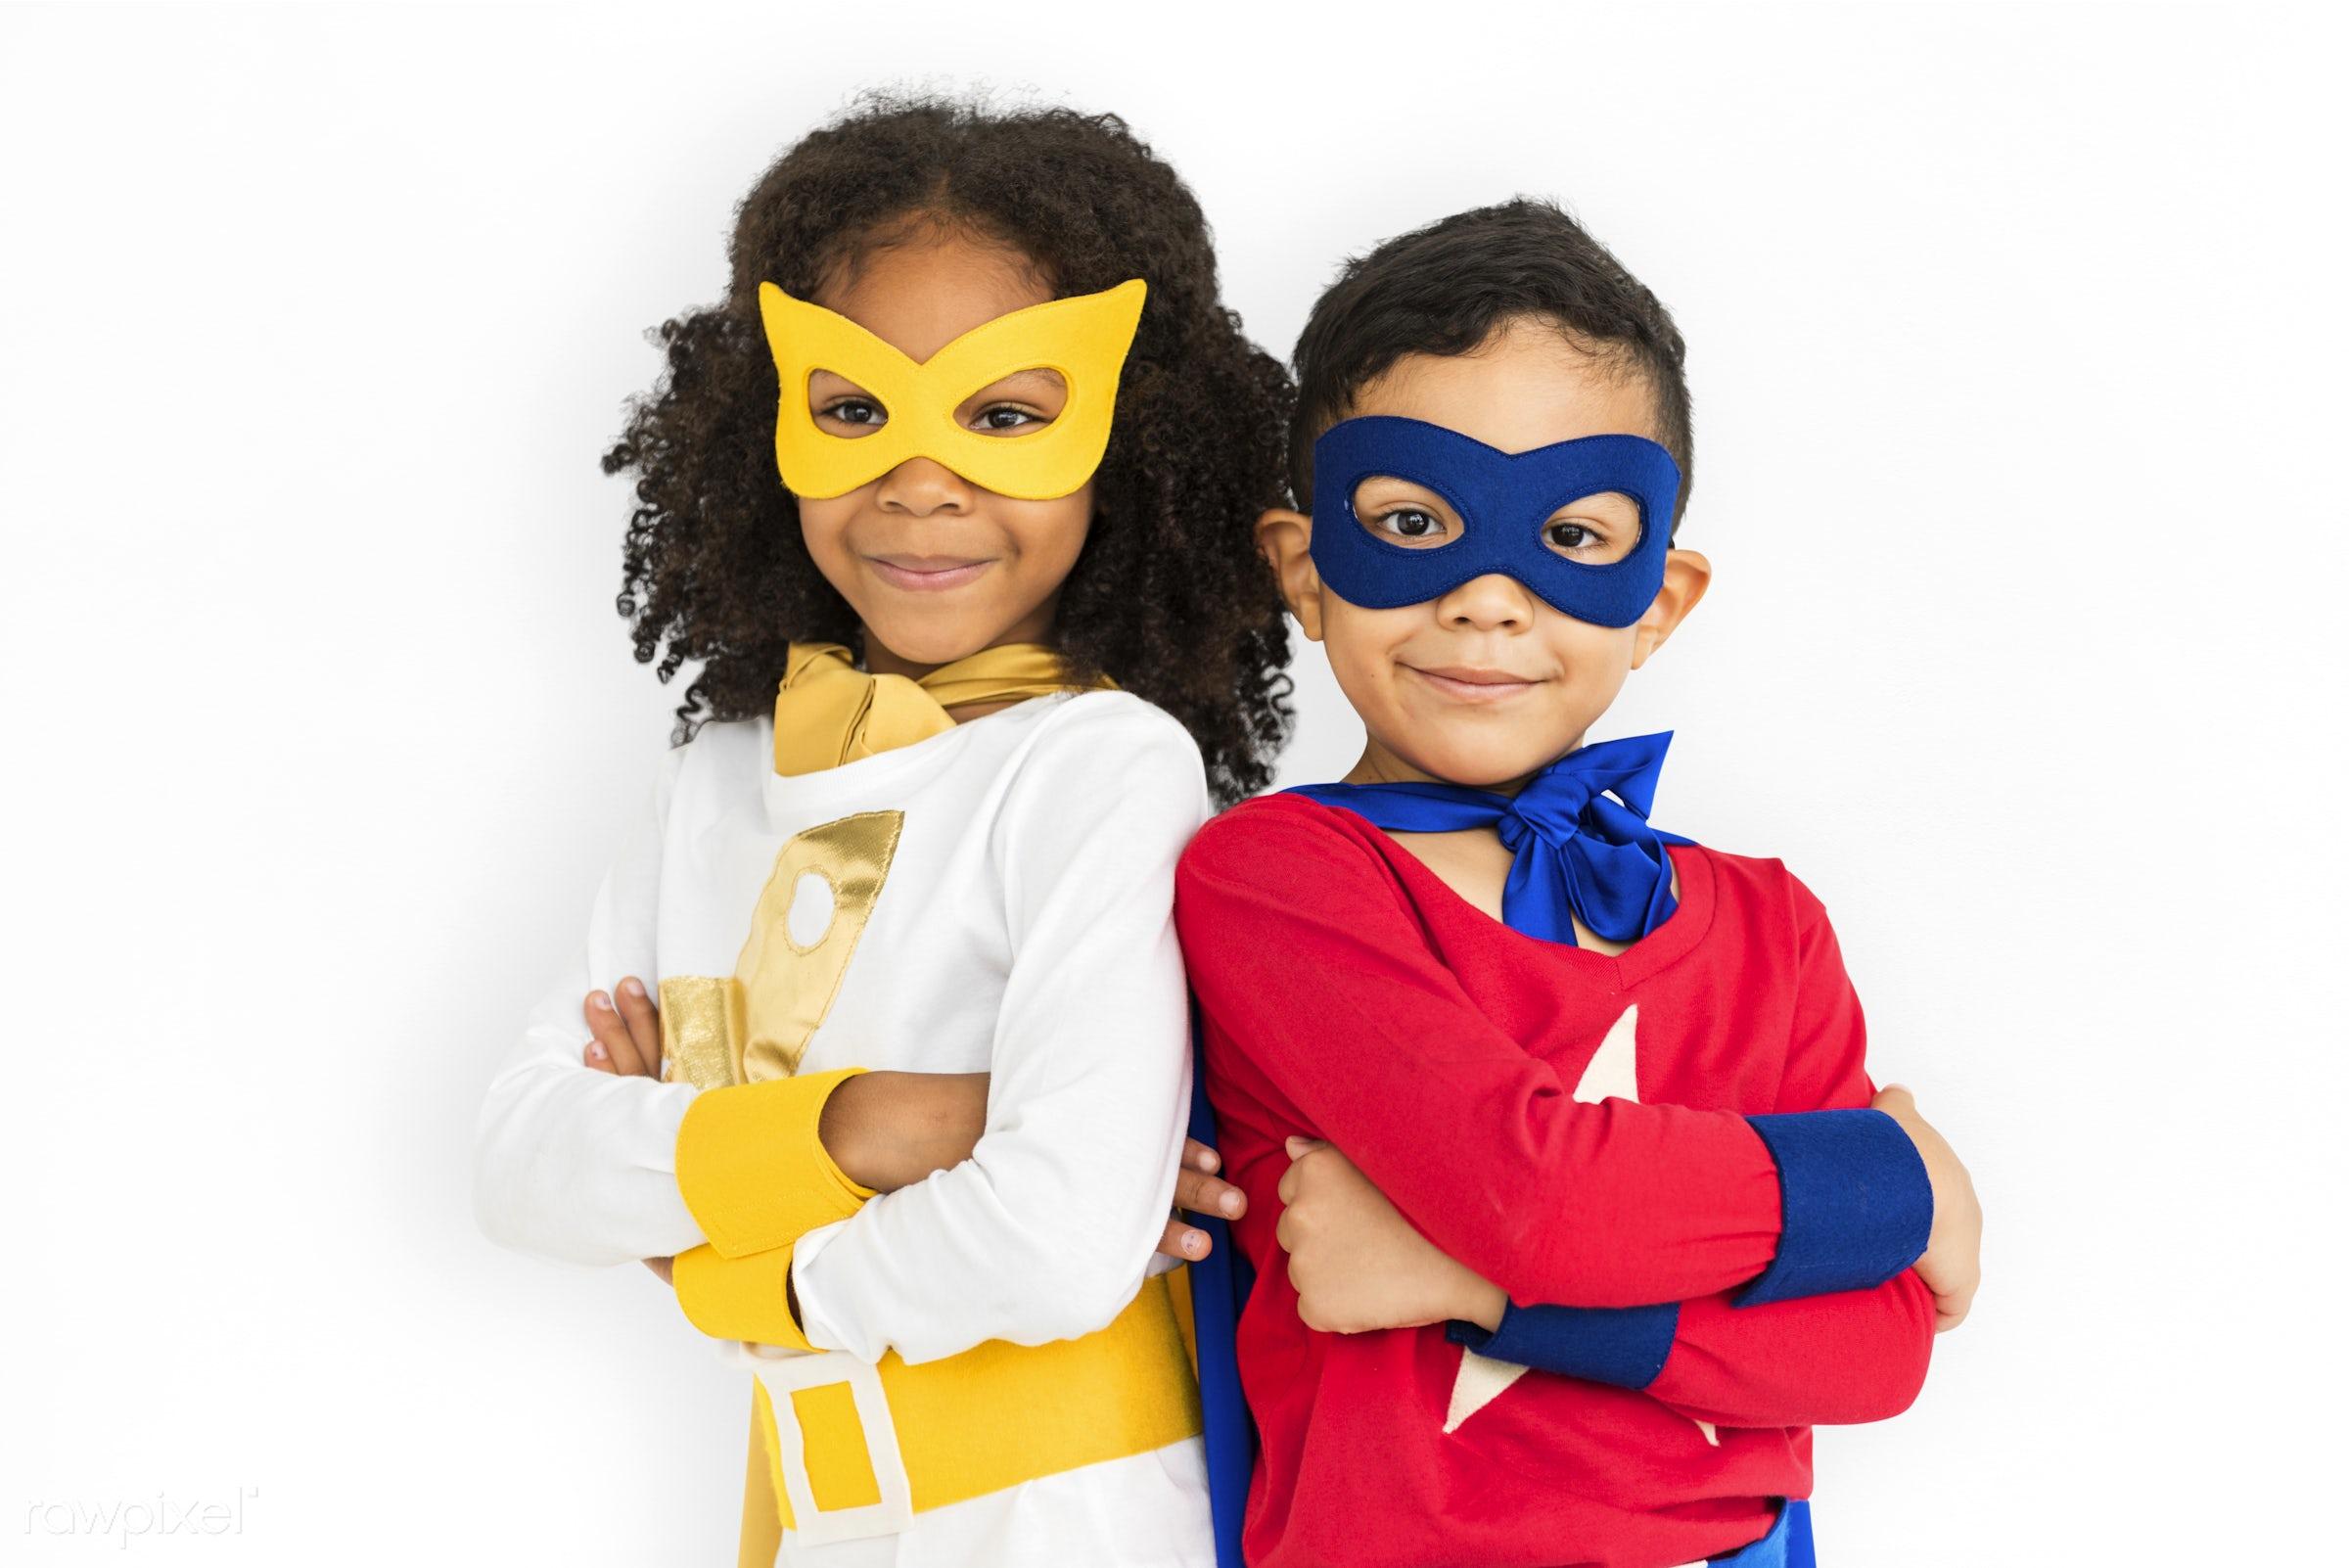 children, courageous, kid, adolescence, child, girl, inspiration, leader, idol, childhood, superhero, isolated, hero, white...